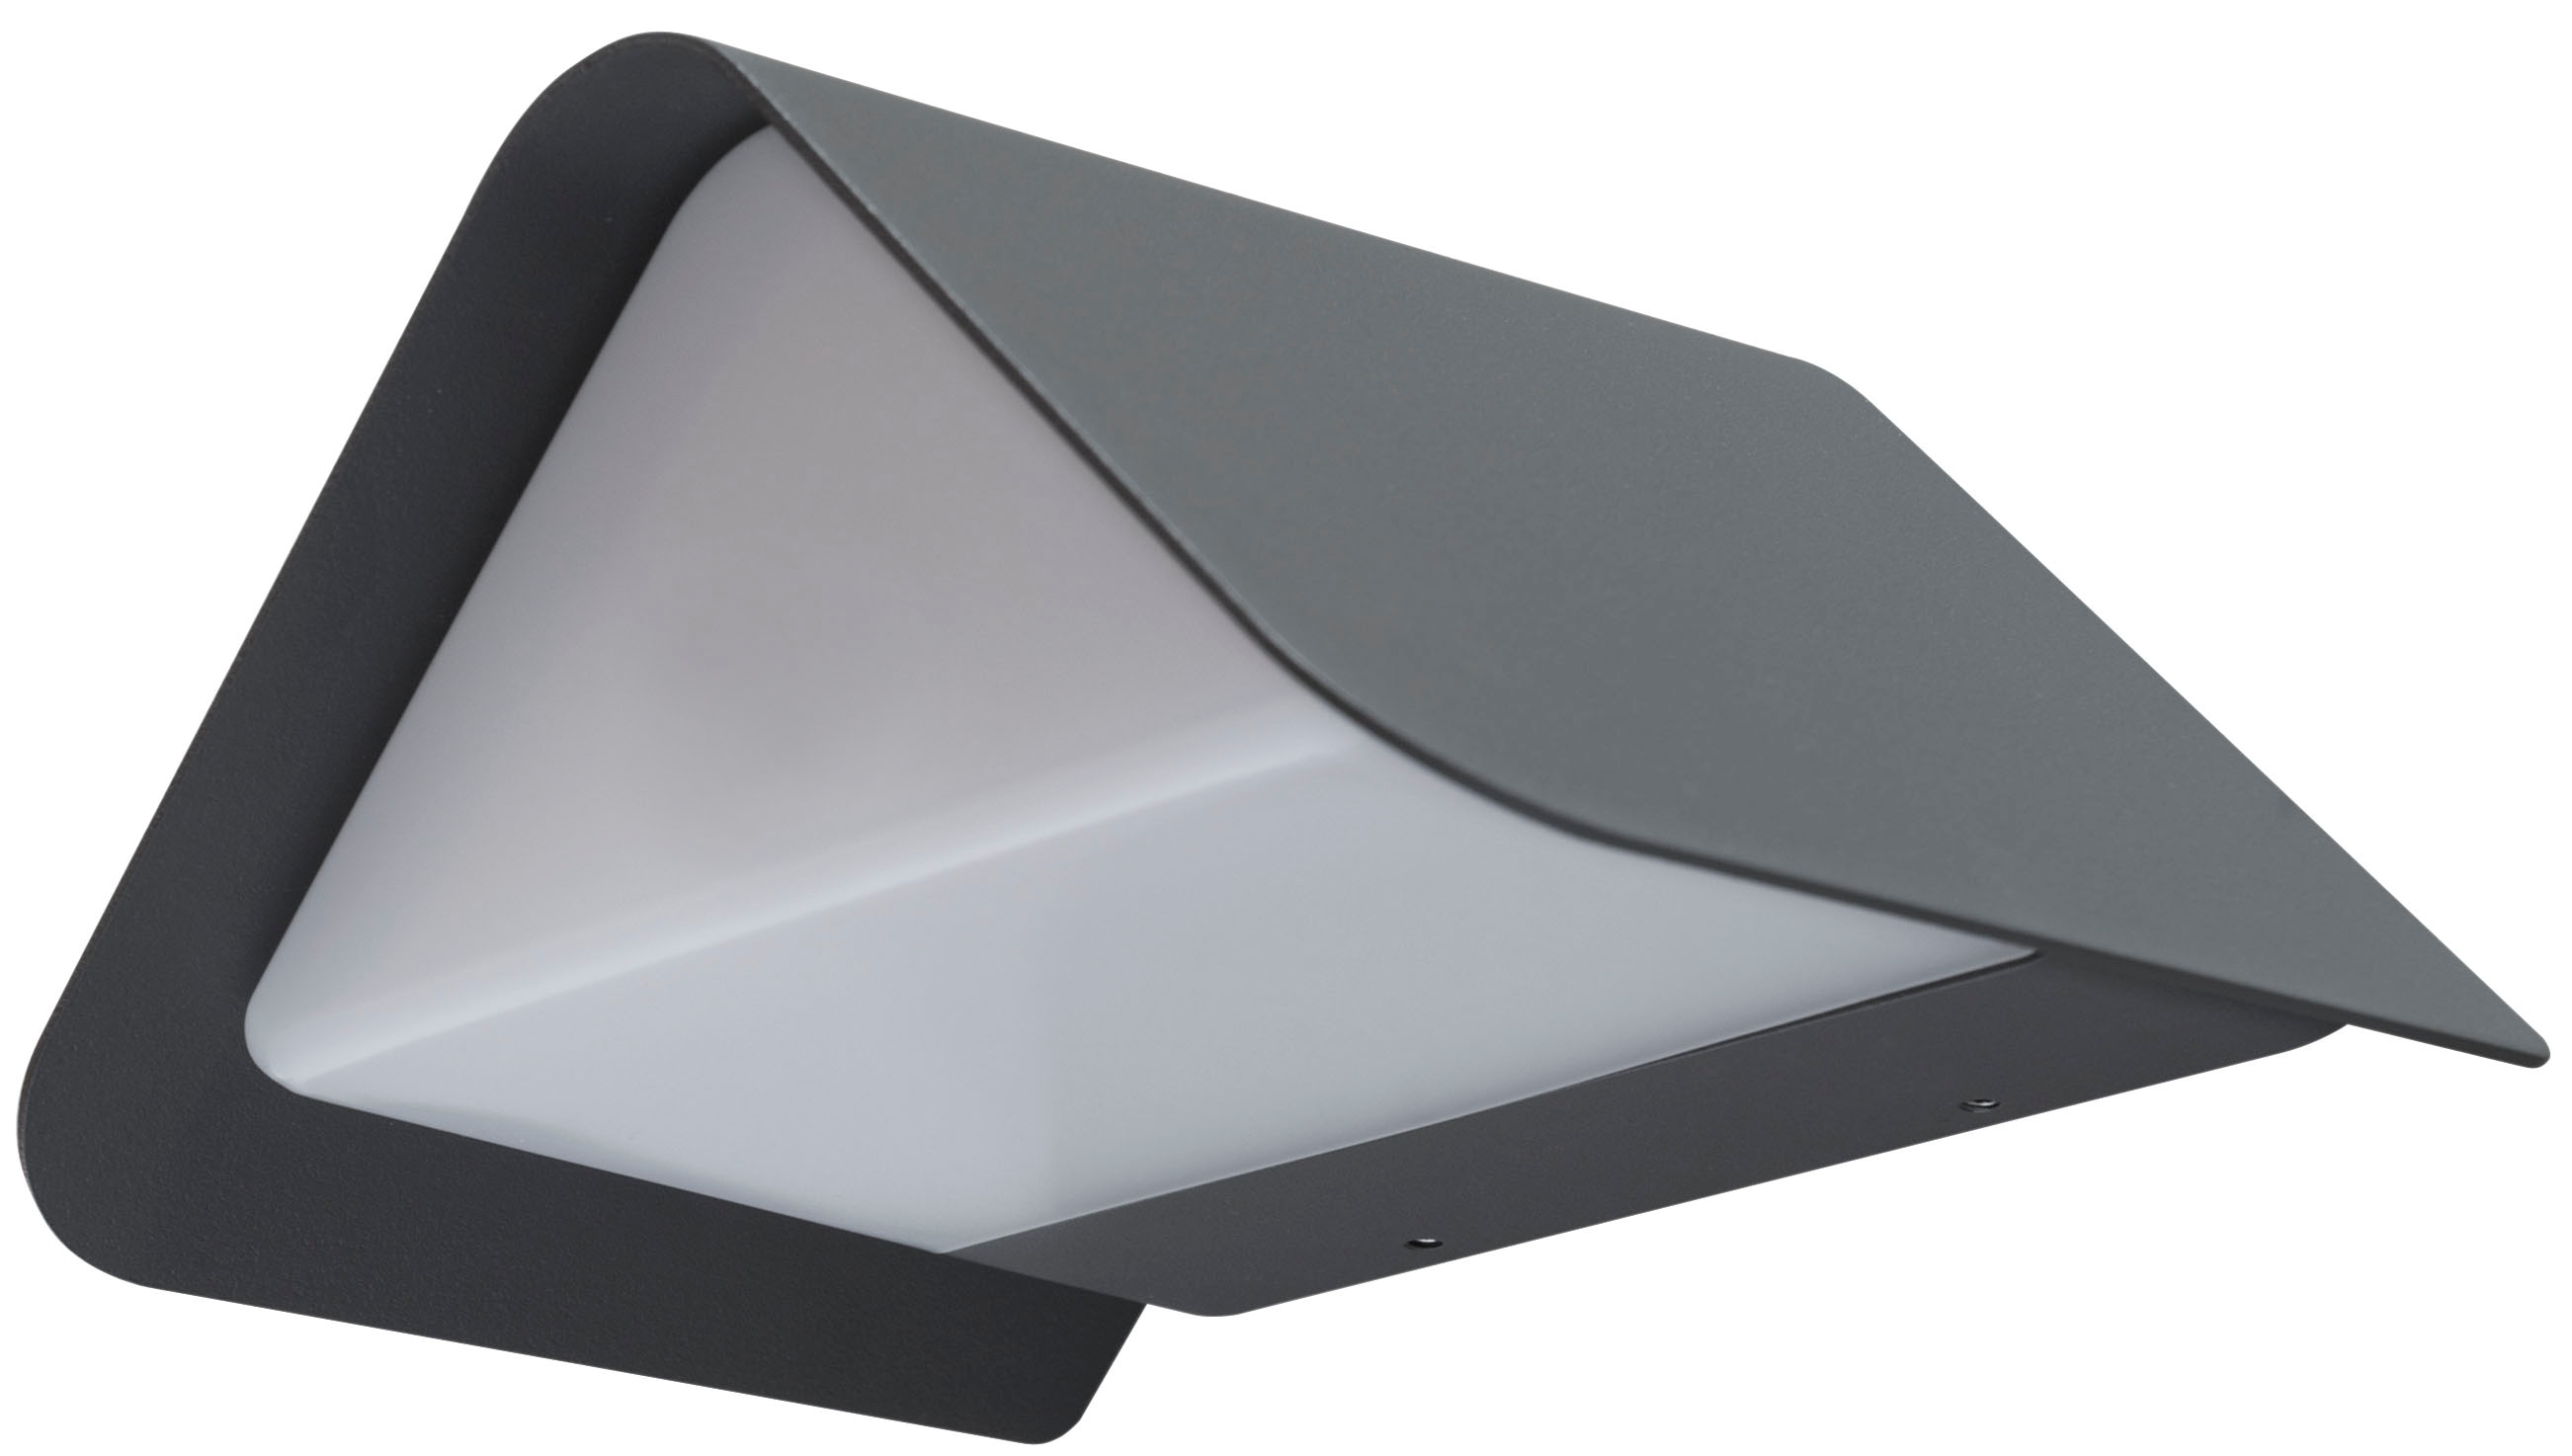 HEITRONIC LED Wandleuchte Java, LED-Modul, 1 St., Warmweiß, Hell mit 630 lm Lichtstrom